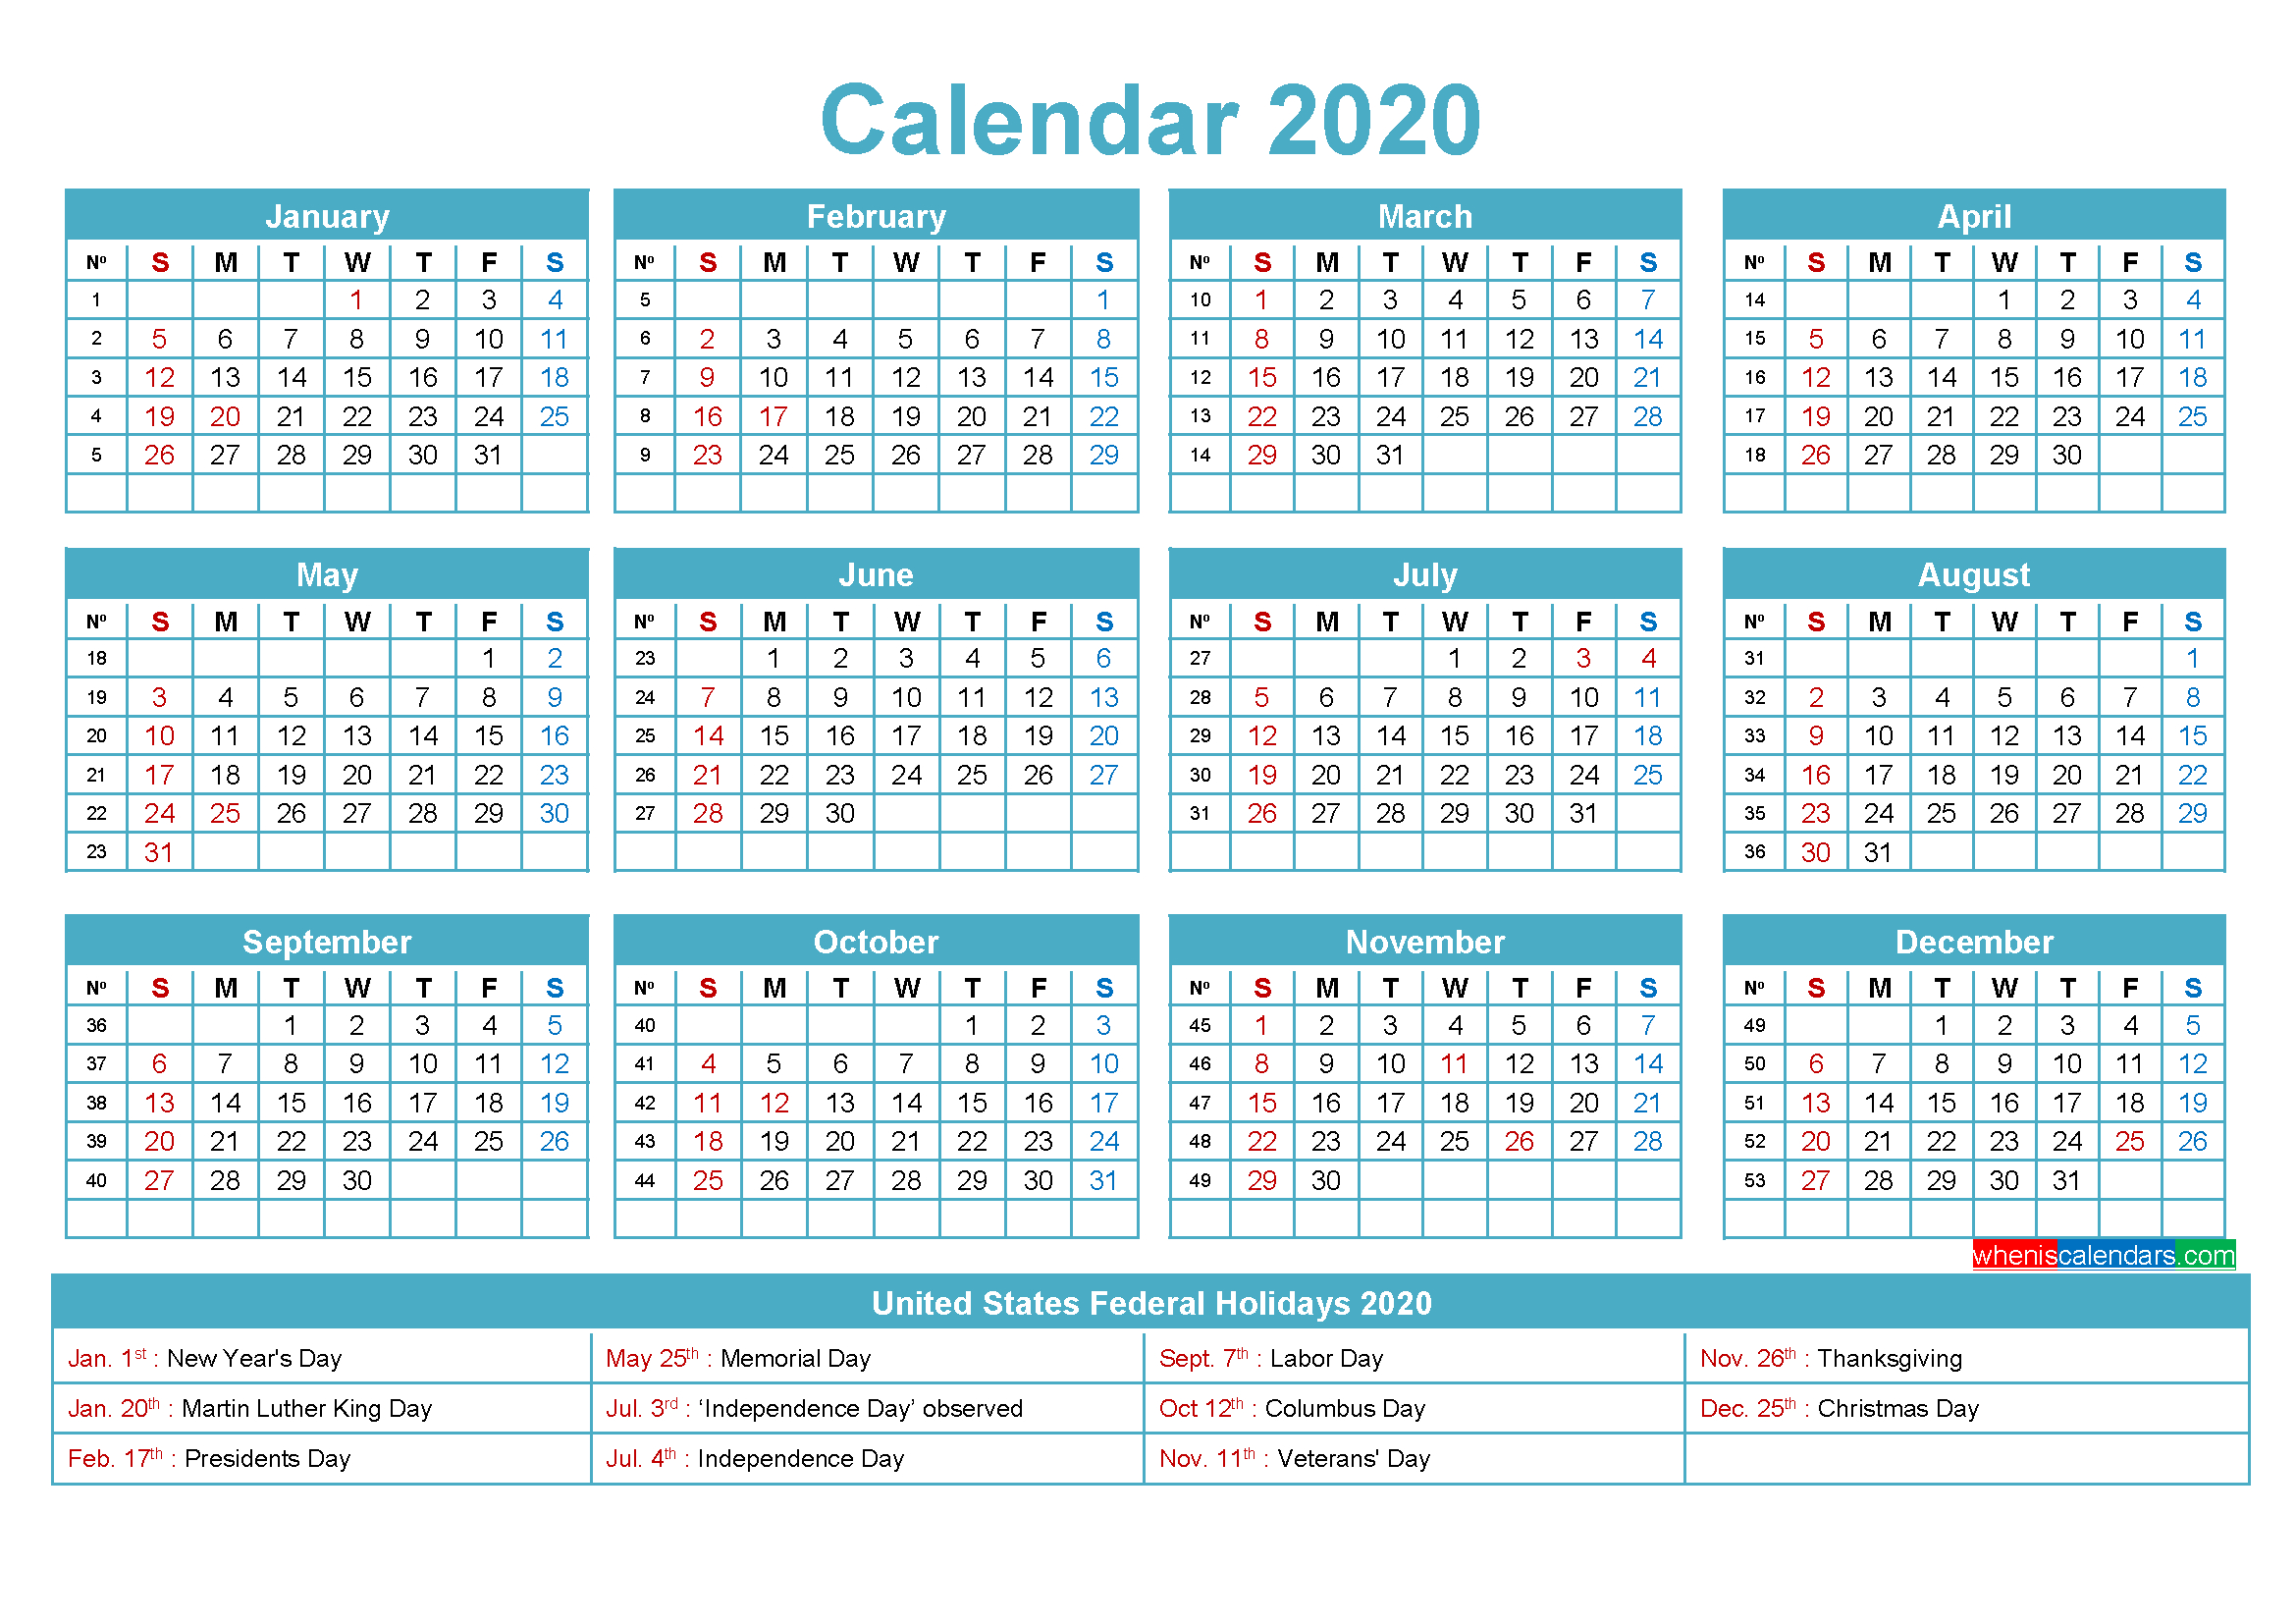 Mini Desk Calendar 2020 Free Printable | Free Printable 2020 Small Calendar Page To Print For Desk